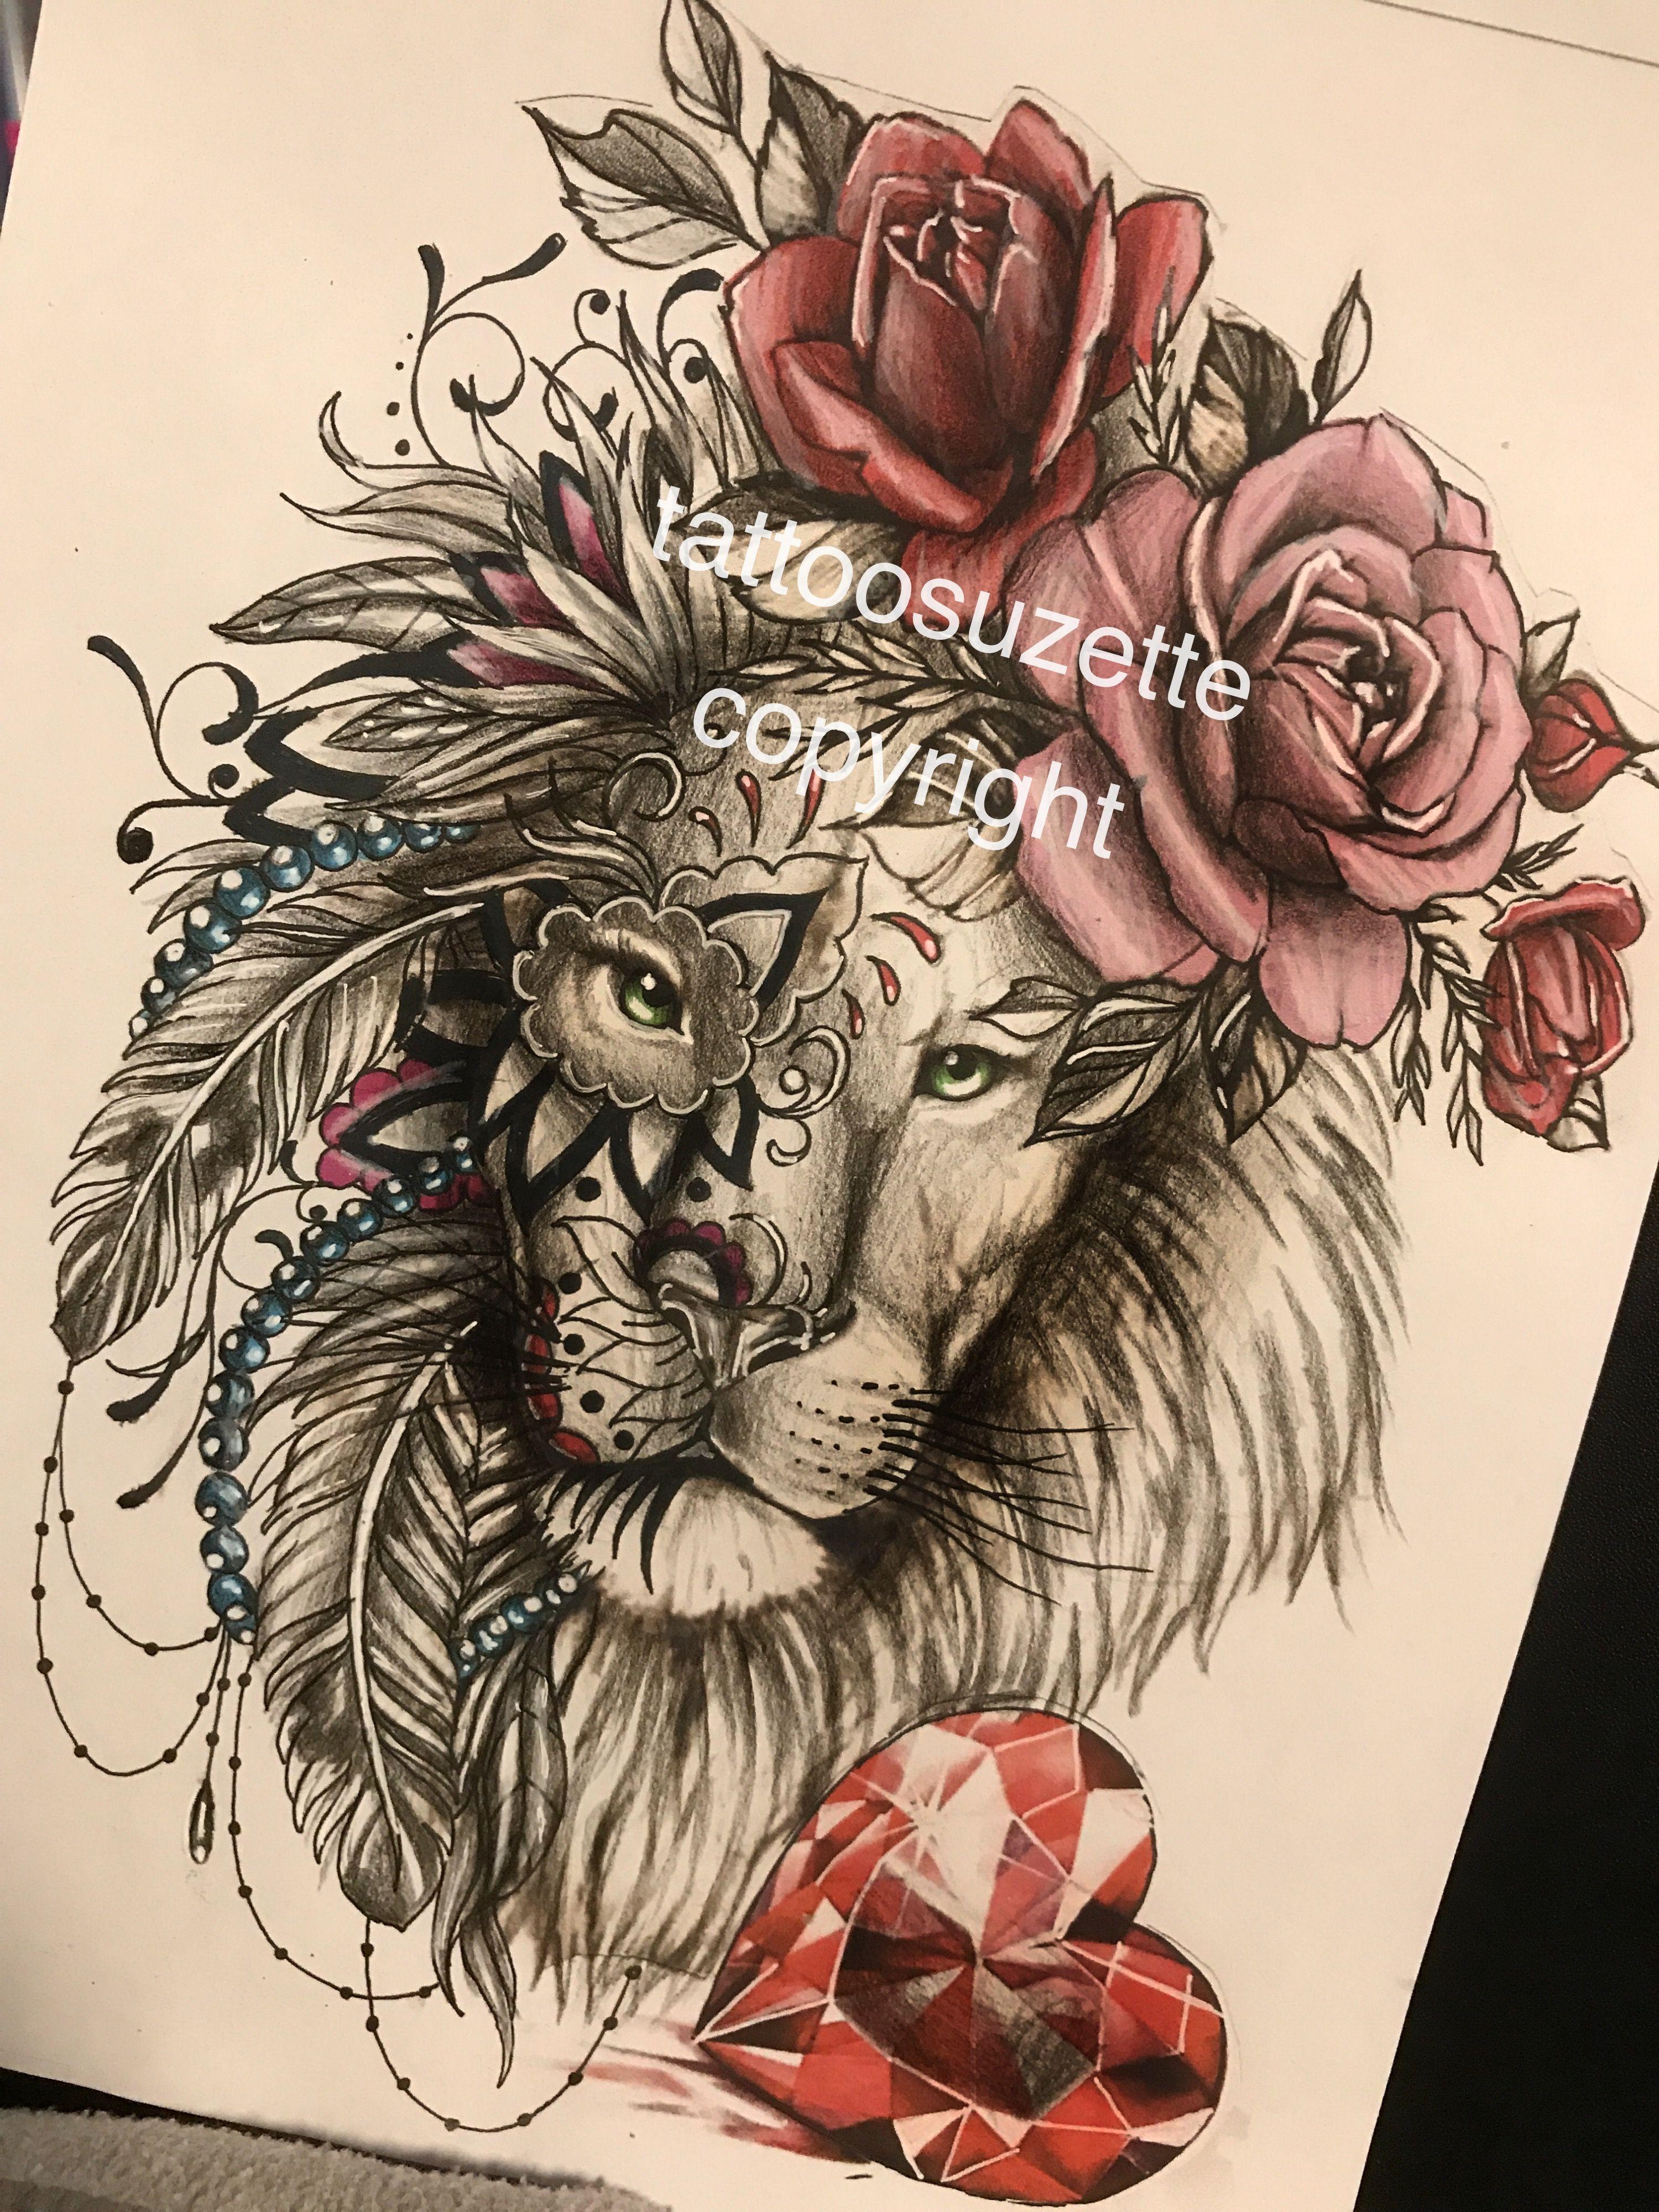 lion tattoo design mandala tattoos pinterest lion tattoo design tattoo designs and lions. Black Bedroom Furniture Sets. Home Design Ideas